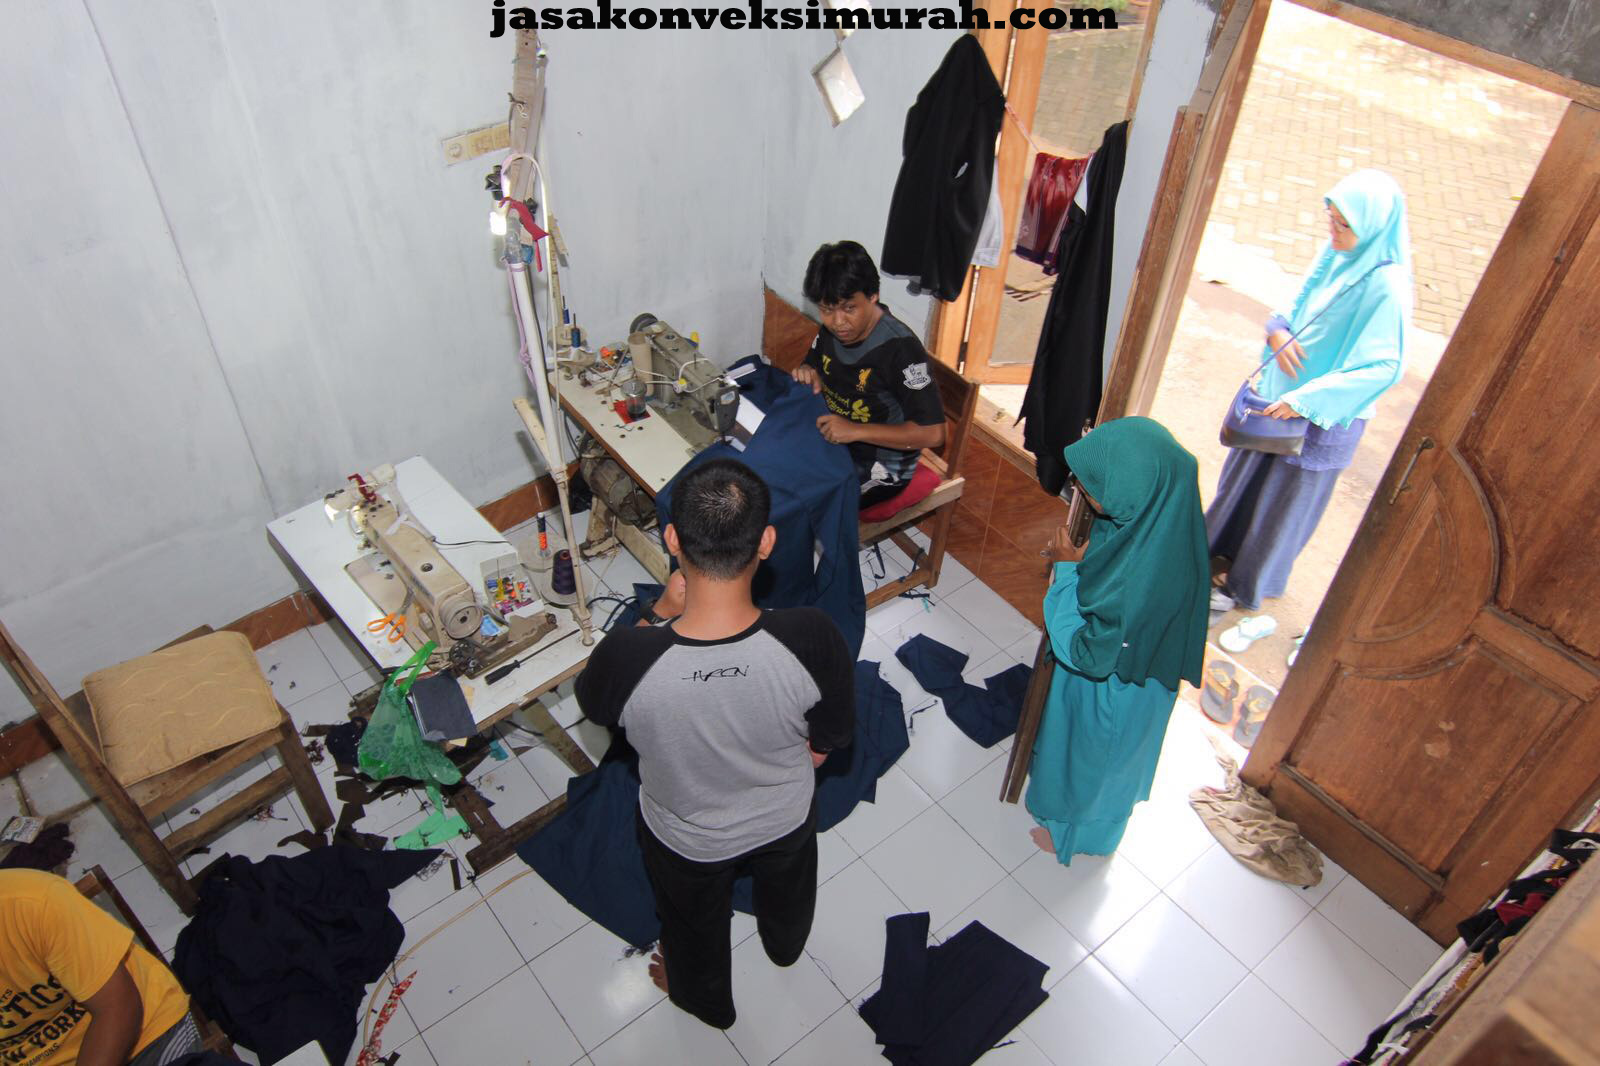 Jasa Konveksi Murah di Pondok Kopi Jakarta Timur